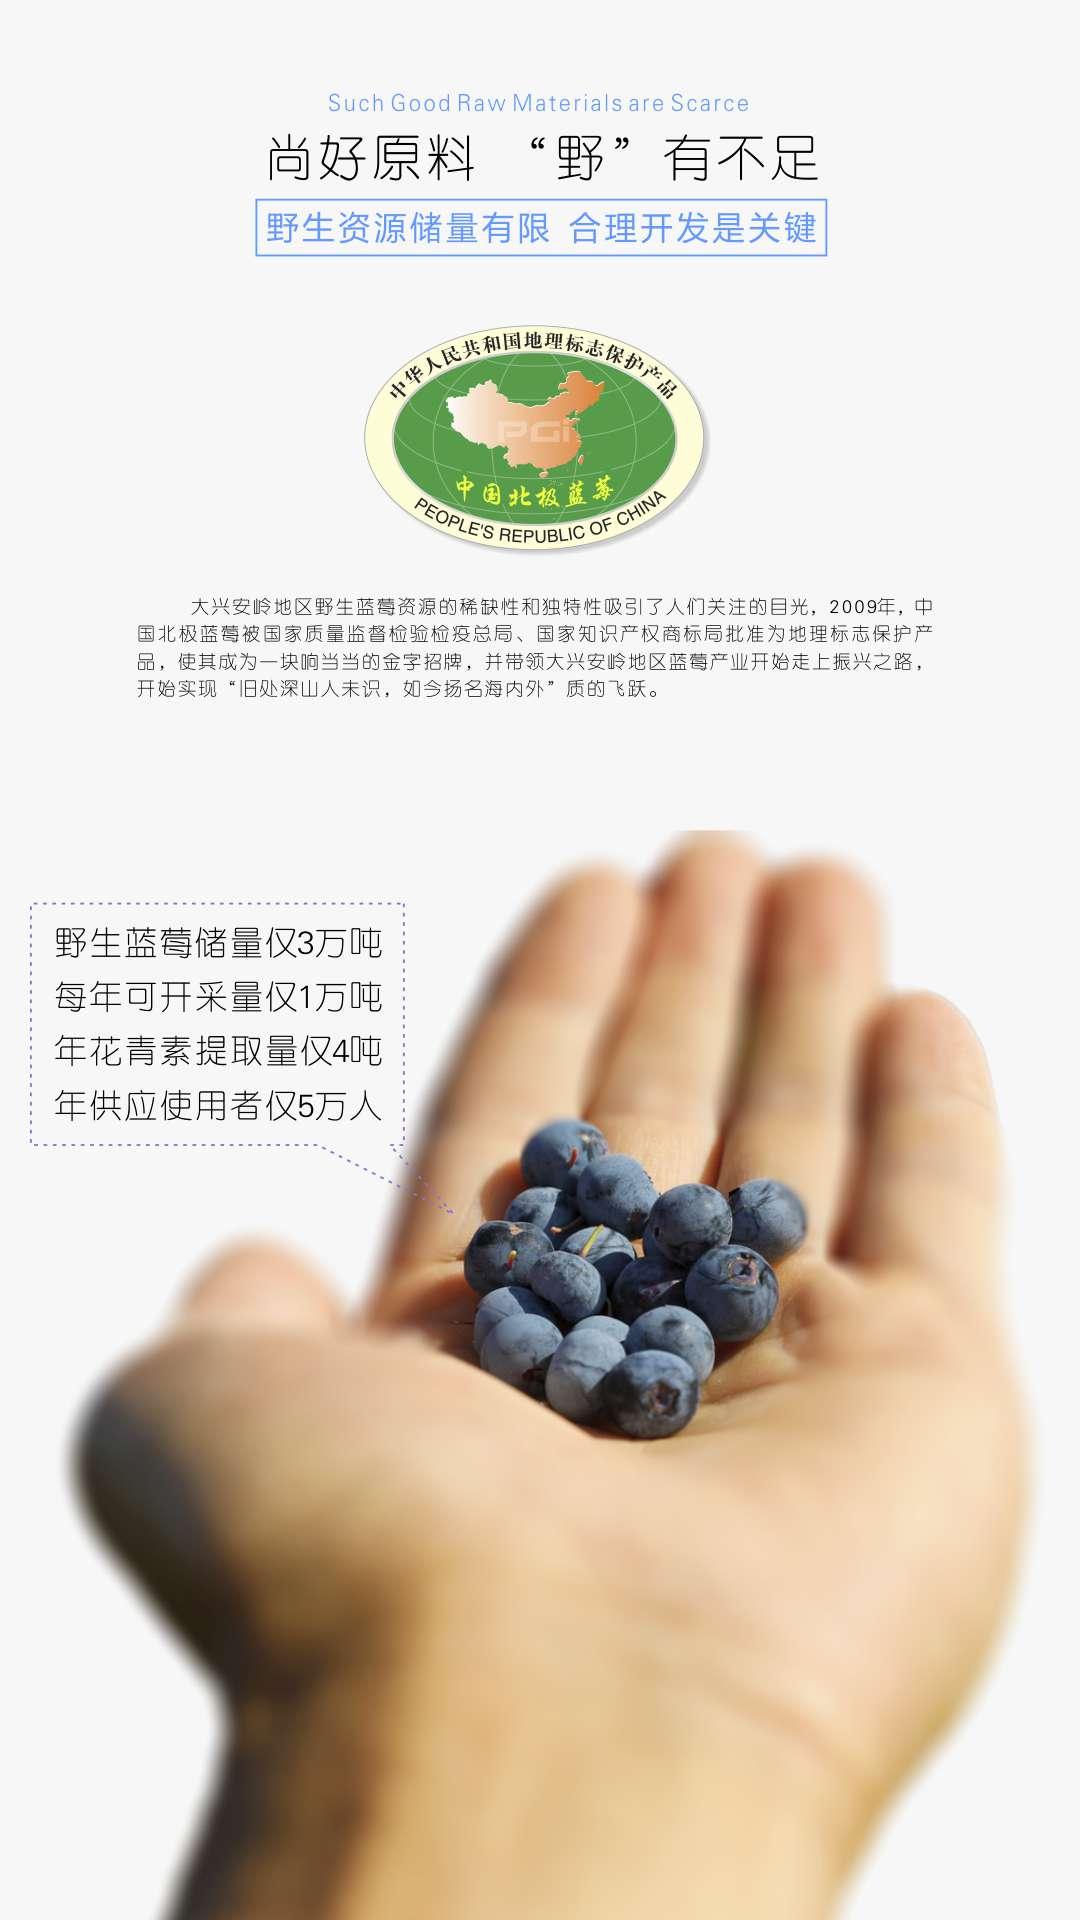 Z 至臻尚品-臻明眸藍莓花青素片-06.jpg